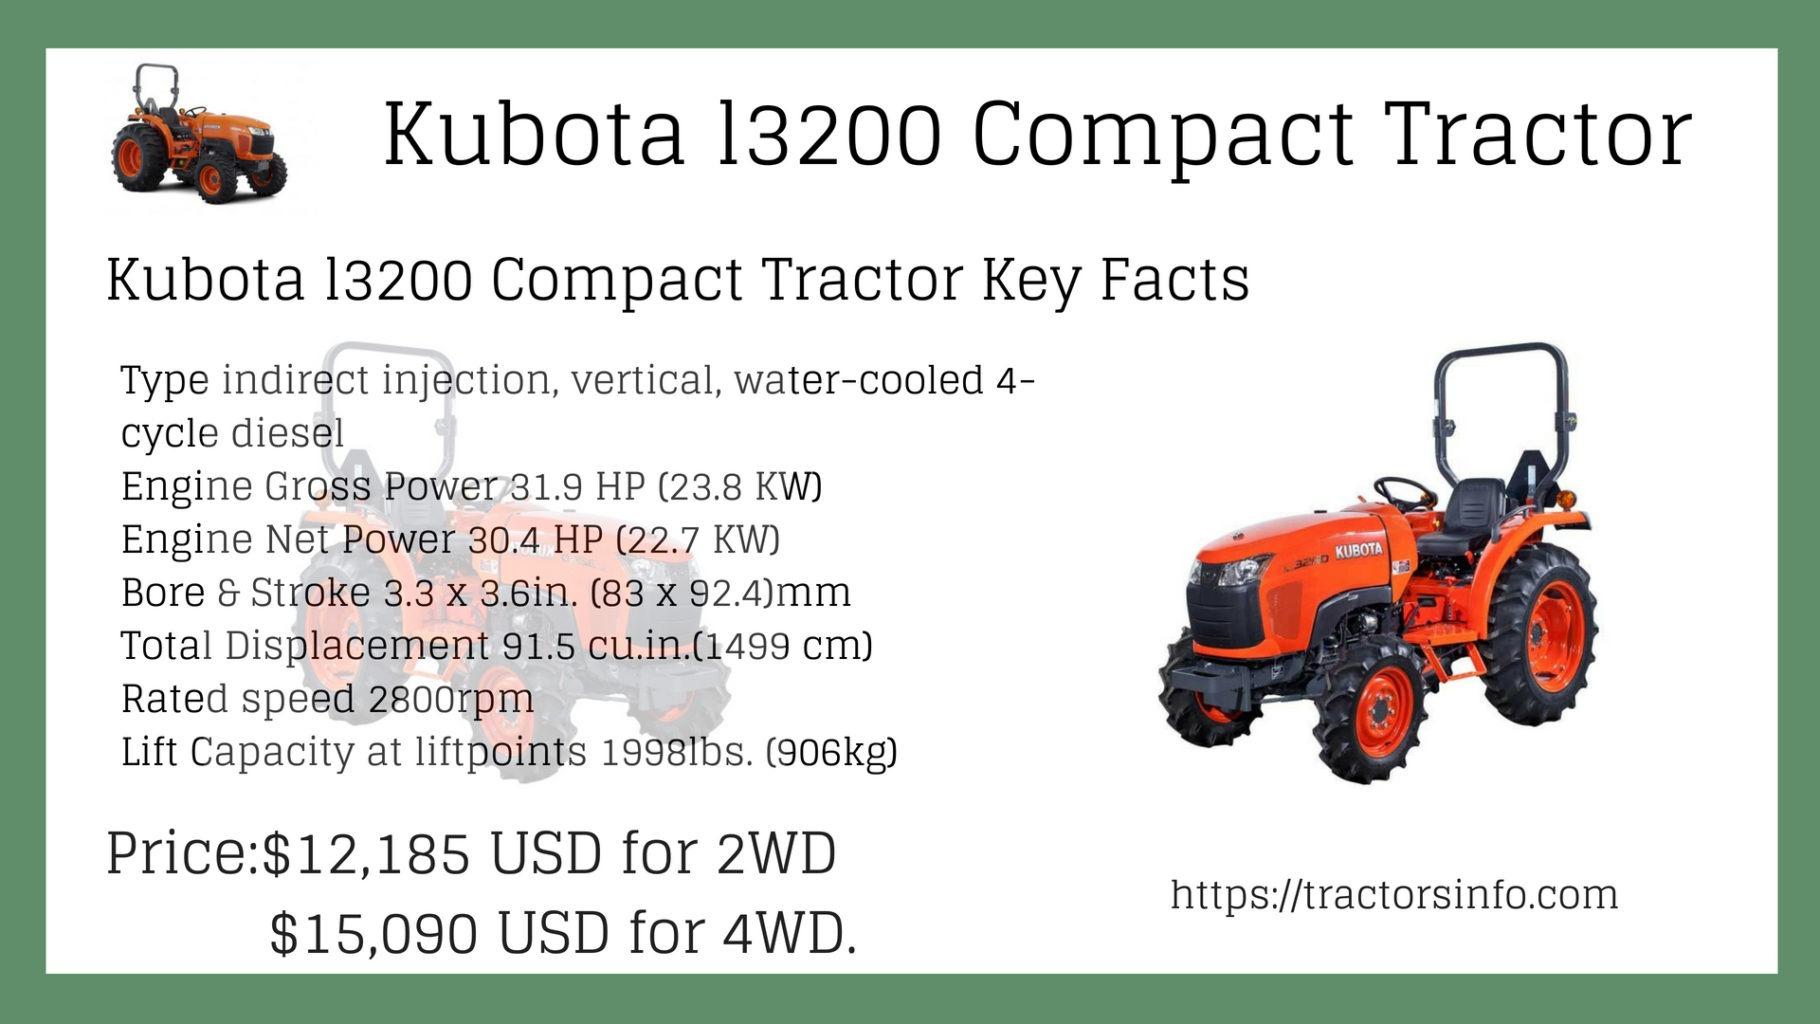 Kubota l3200 Price UK, Backhoe Attachment, Specs, features